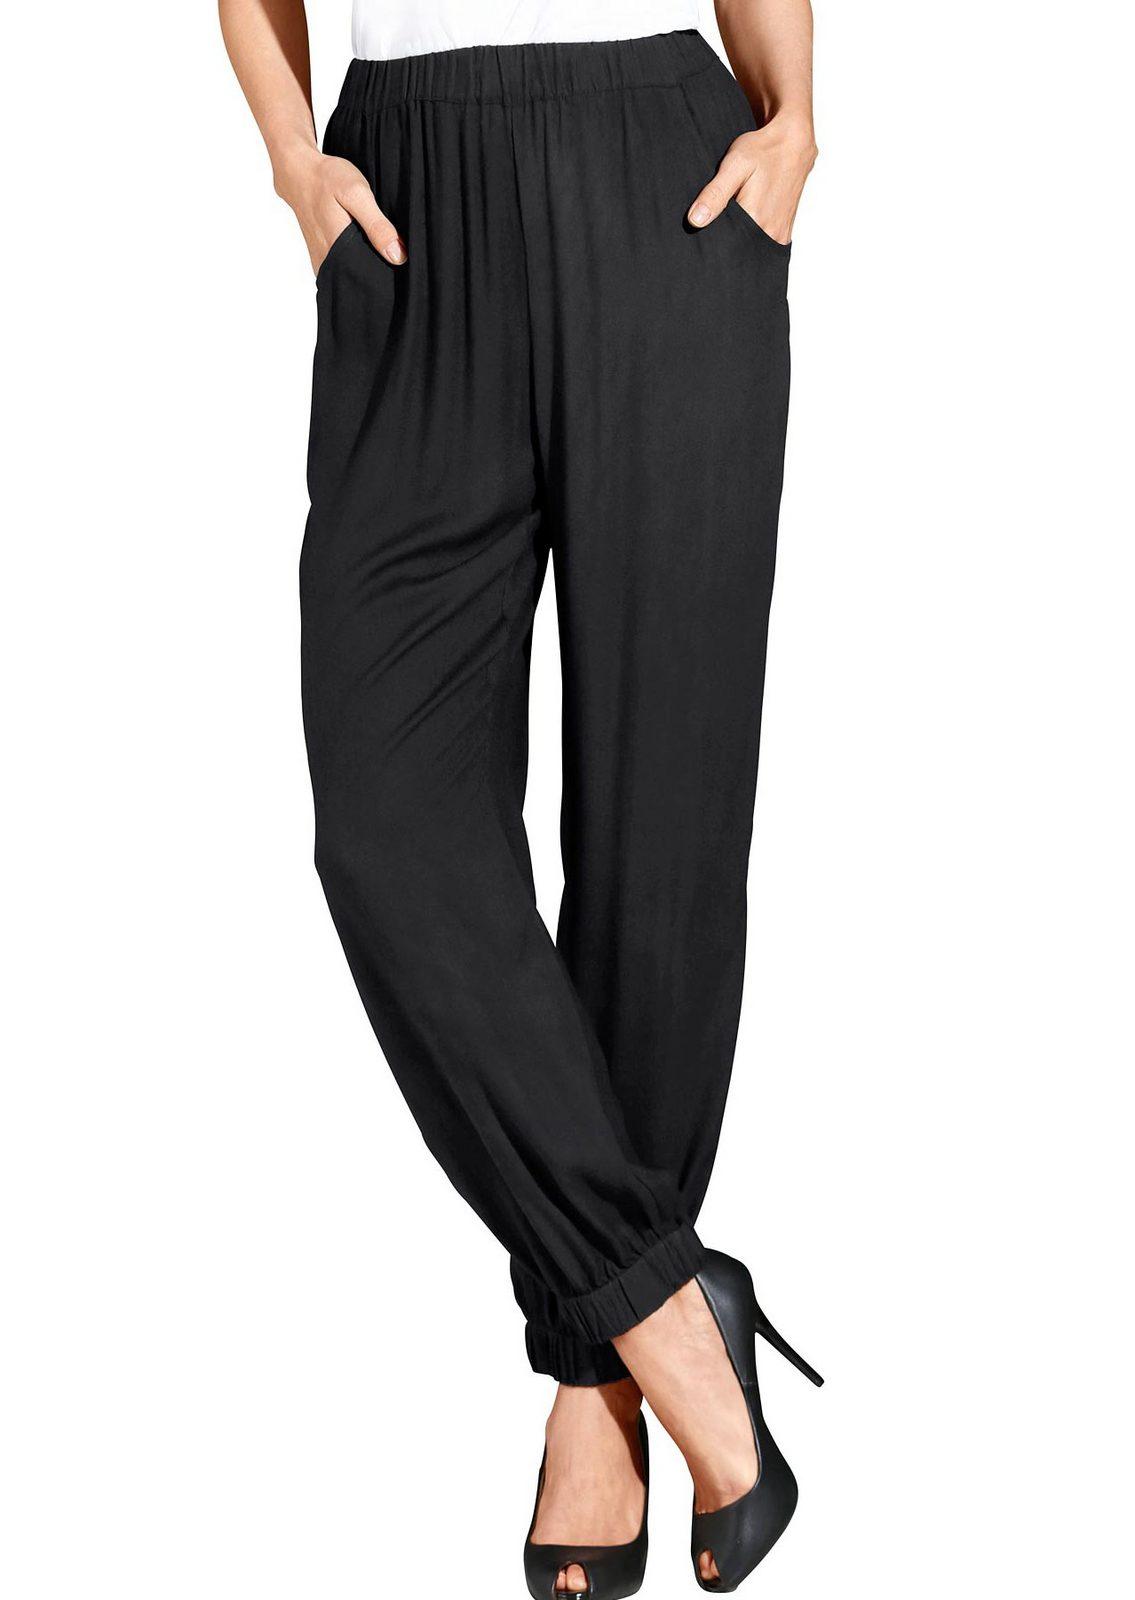 Classic Basics Hose aus weich fließender Viskose